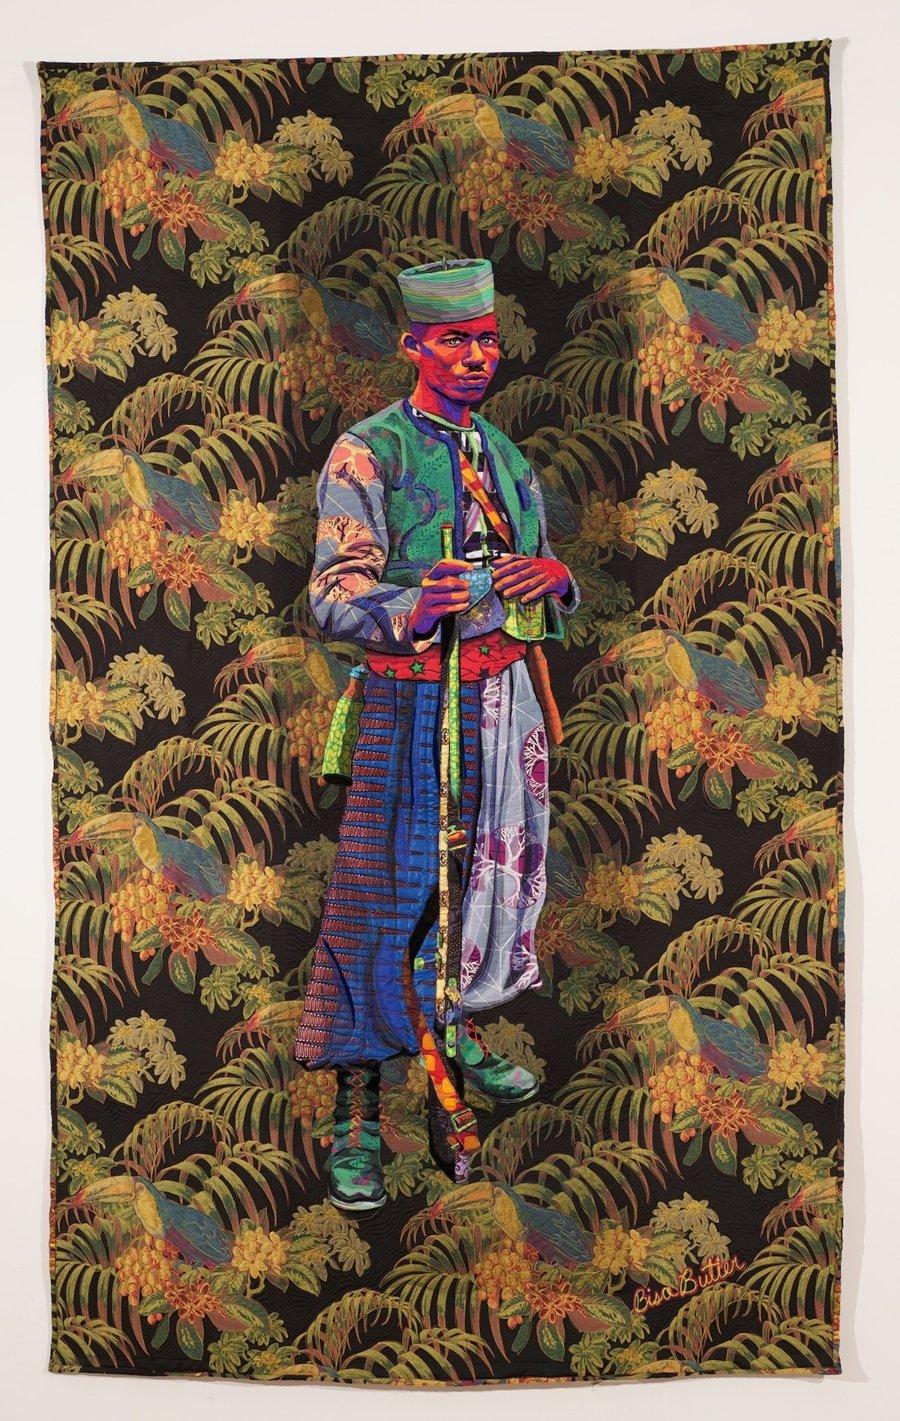 Obra textil de Bisa Butler con el retrato de hombre negro